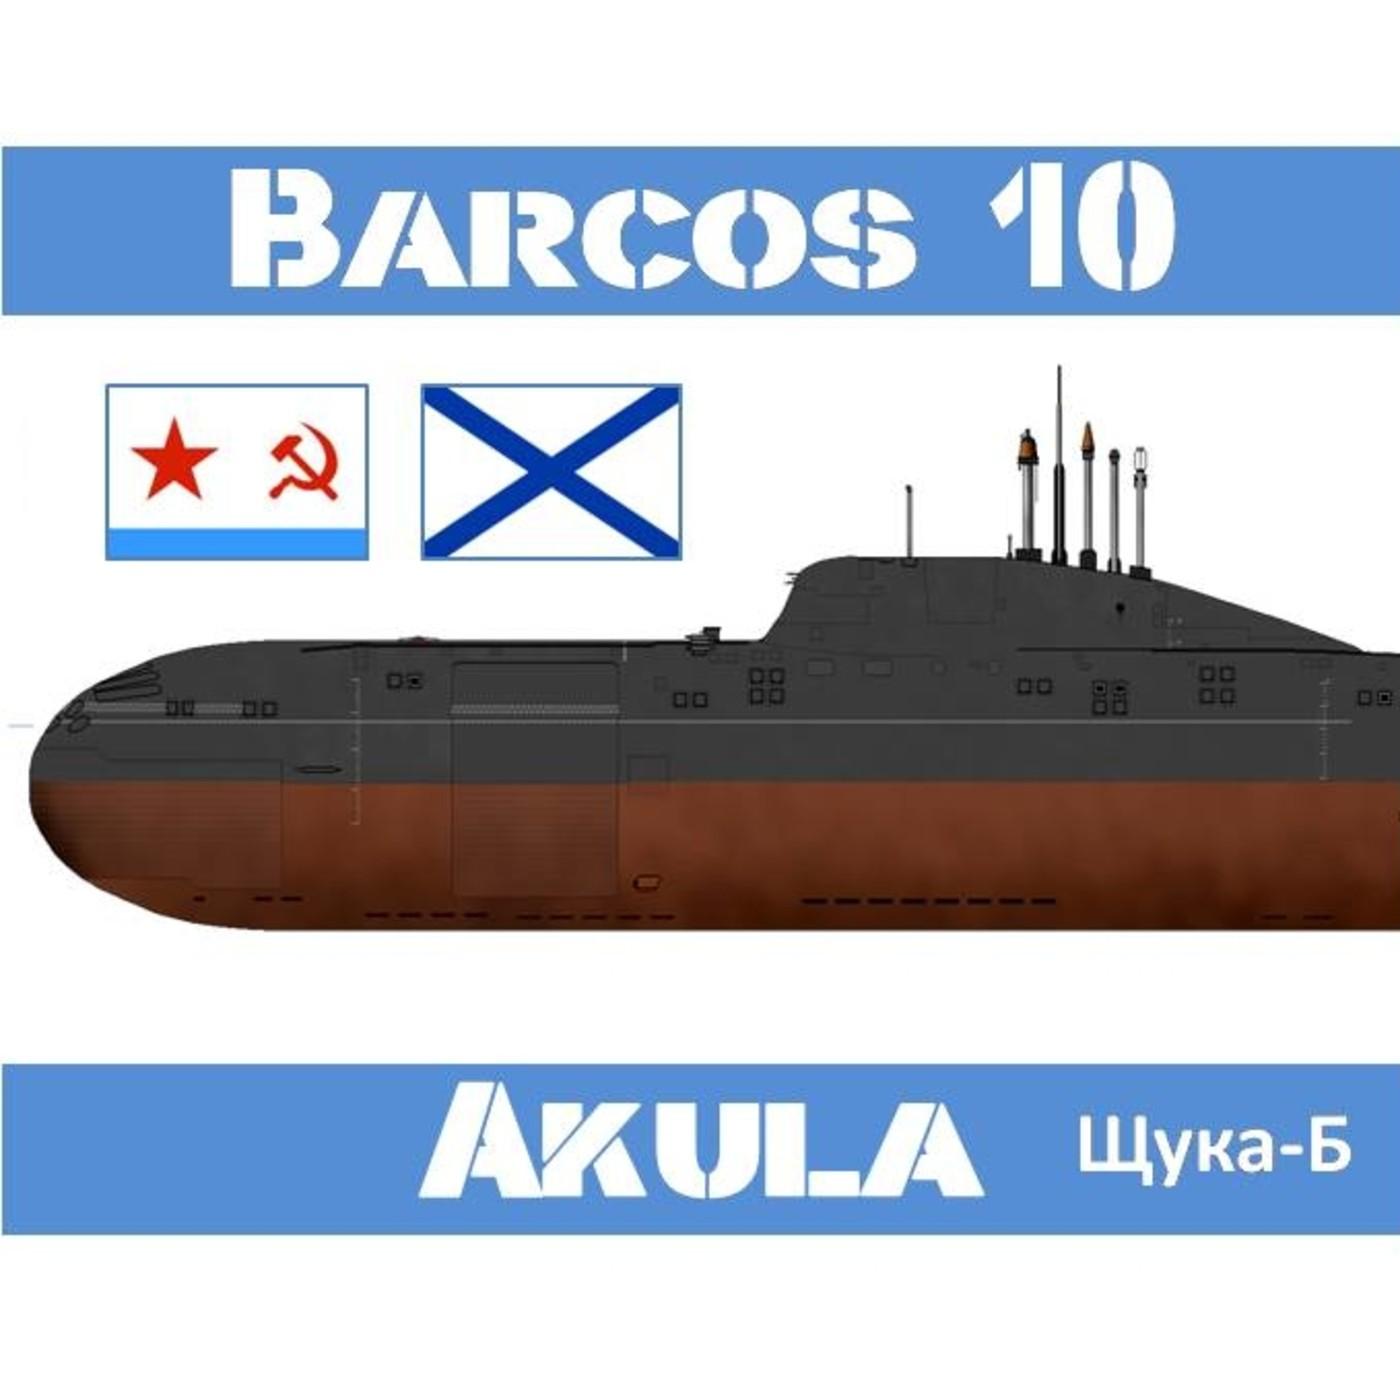 B-10#28 AKULA, Tiburón Silencioso